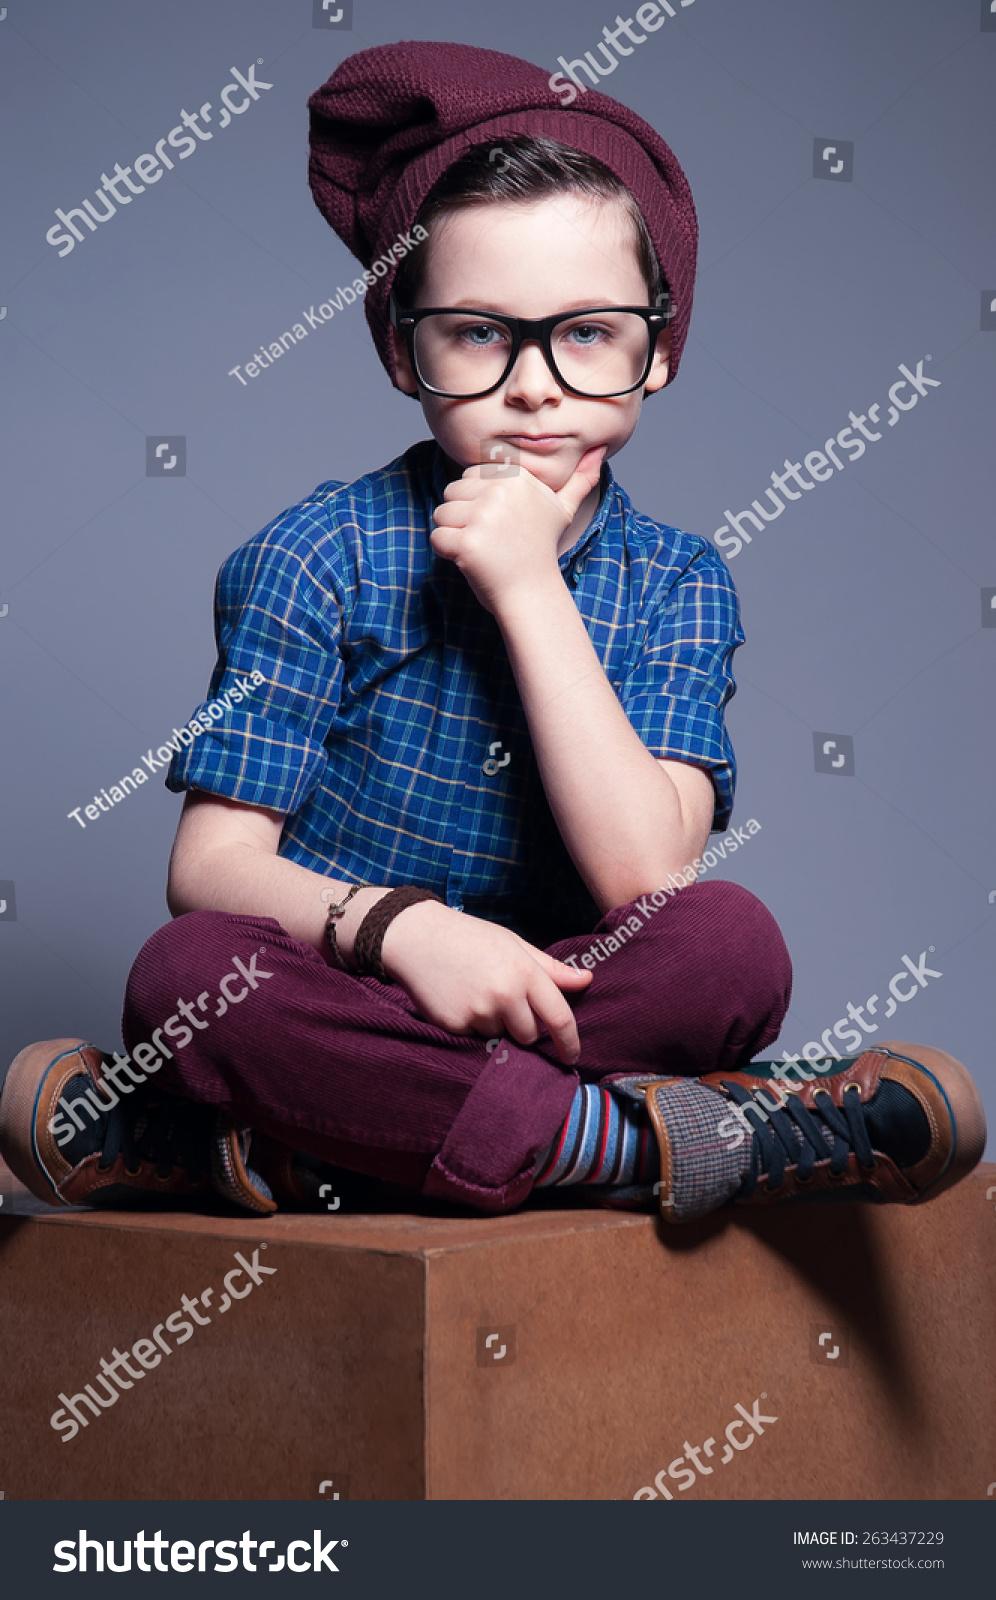 Blue Eyed Kid Glasses Boy Sitting Stock Photo Edit Now 263437229